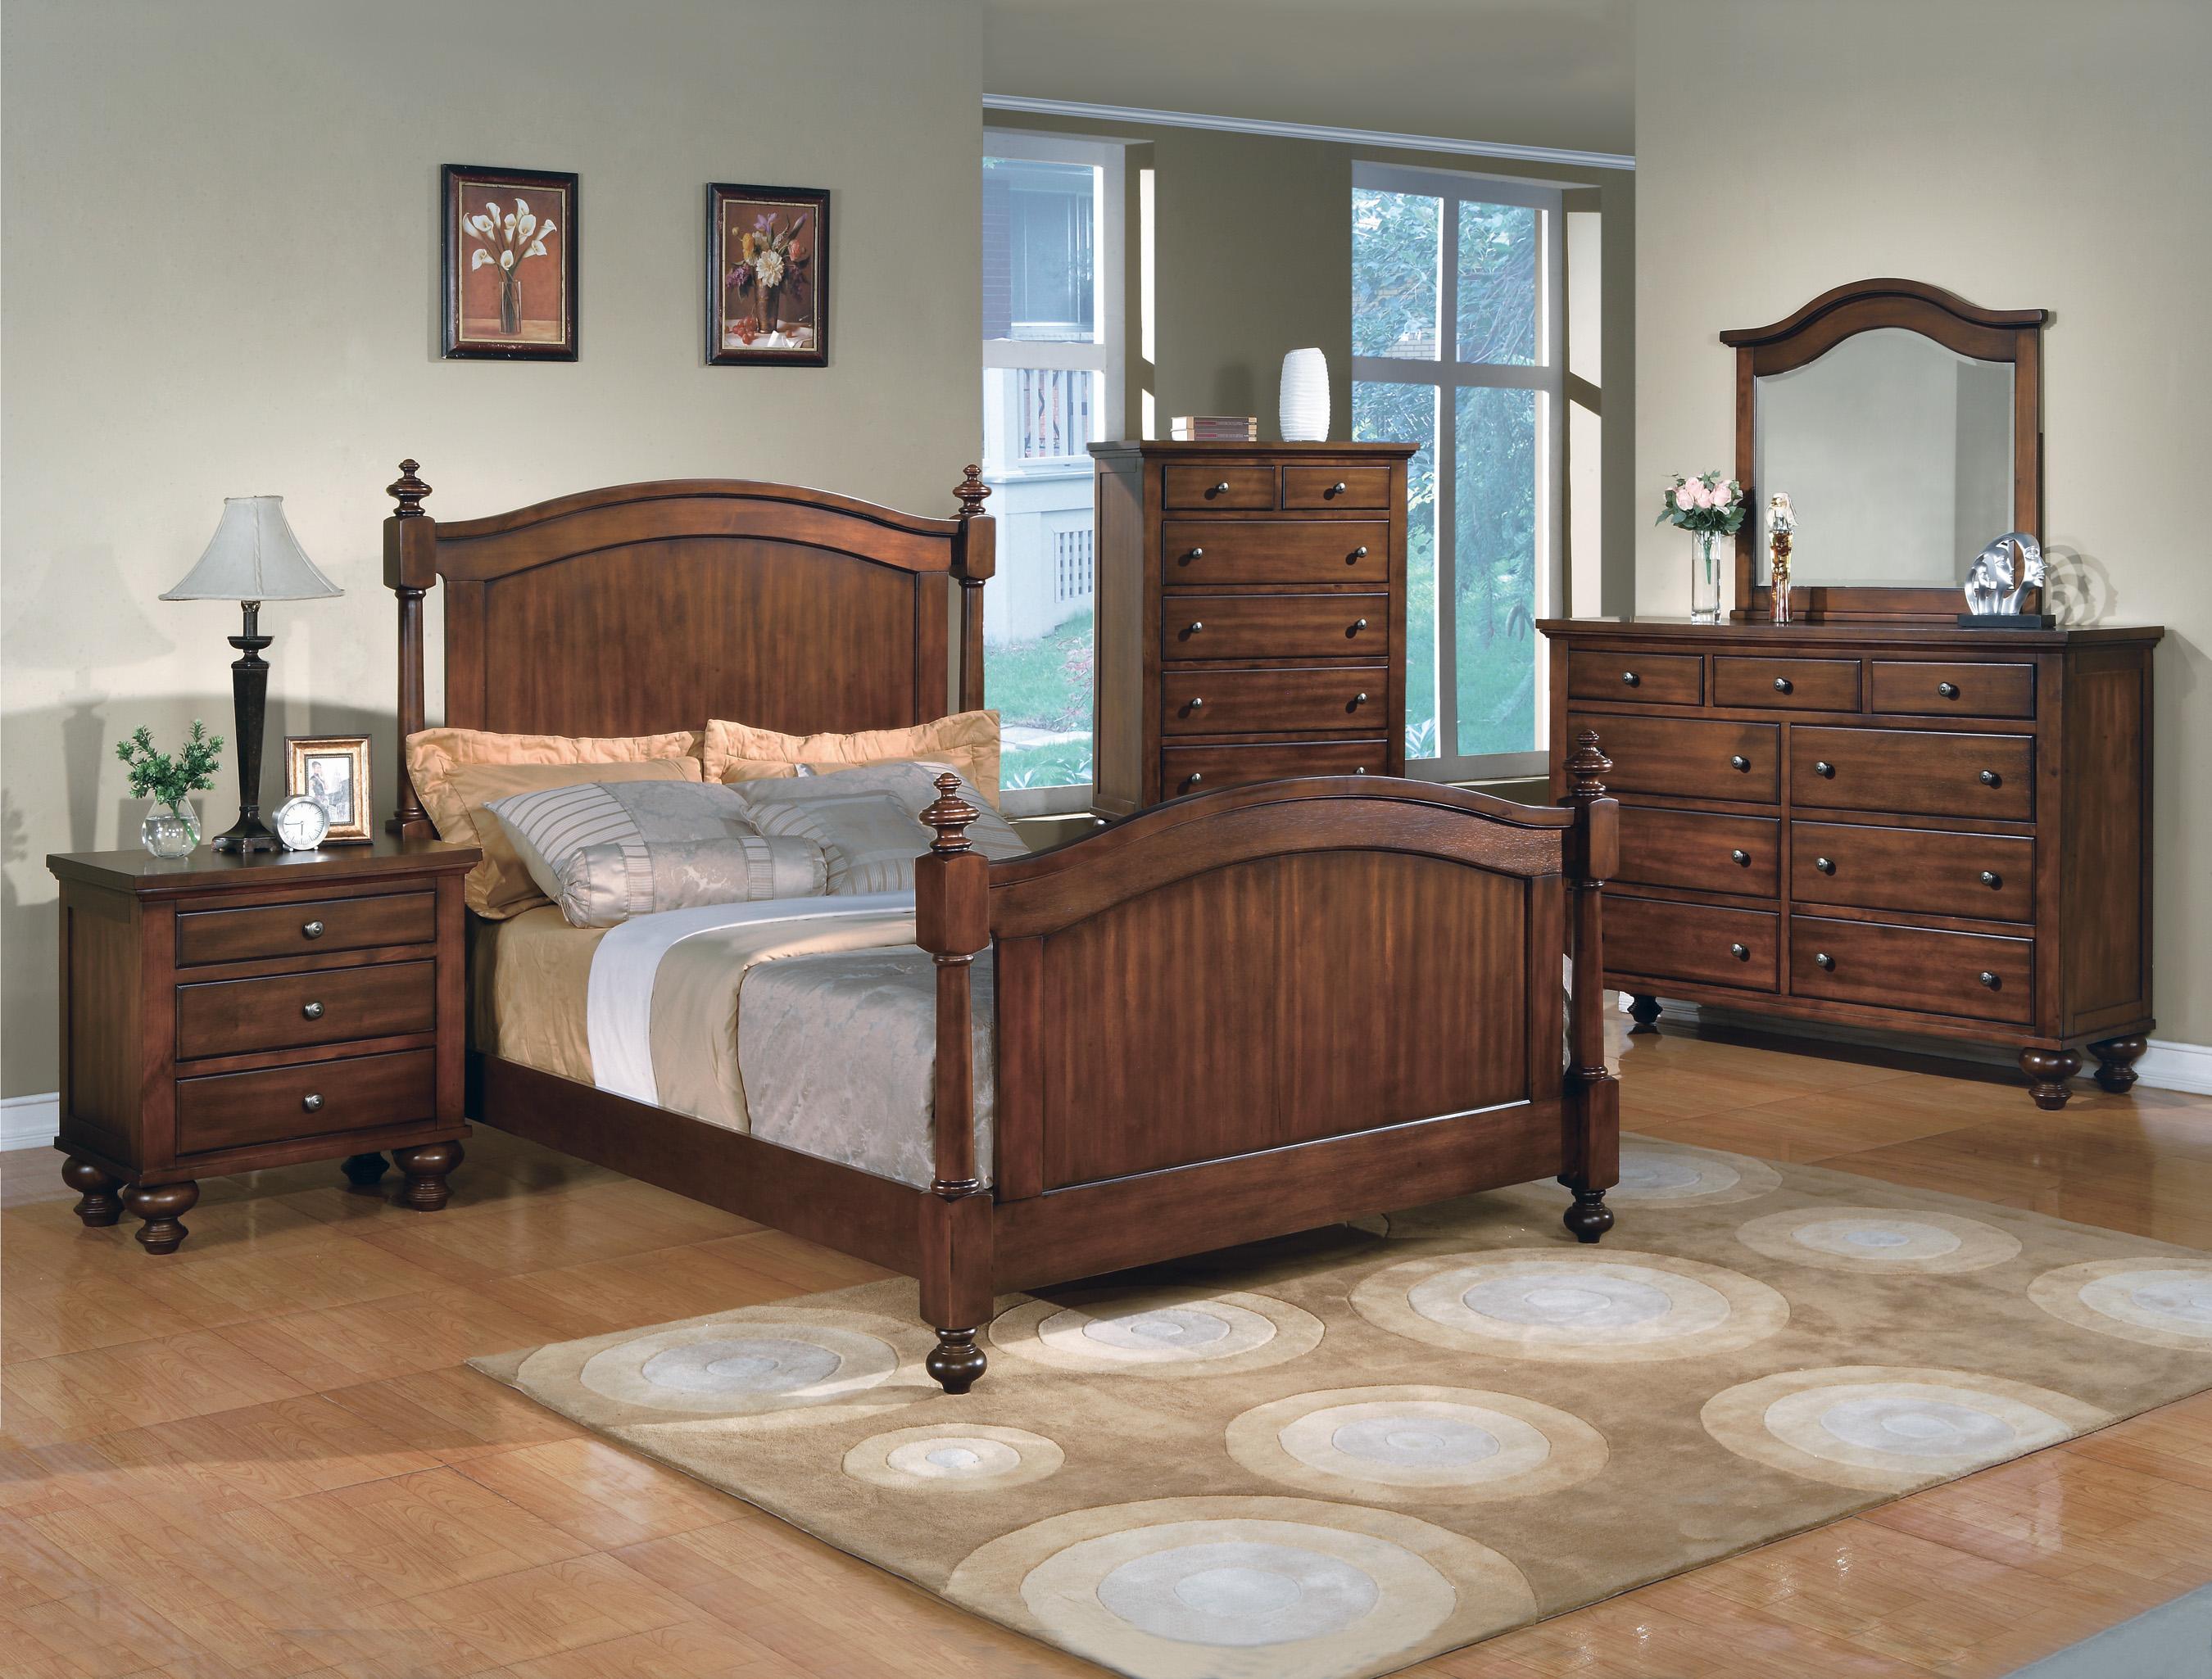 Crown Mark Sommer King Bedroom Group - Item Number: B1304 King Bedroom Group 1